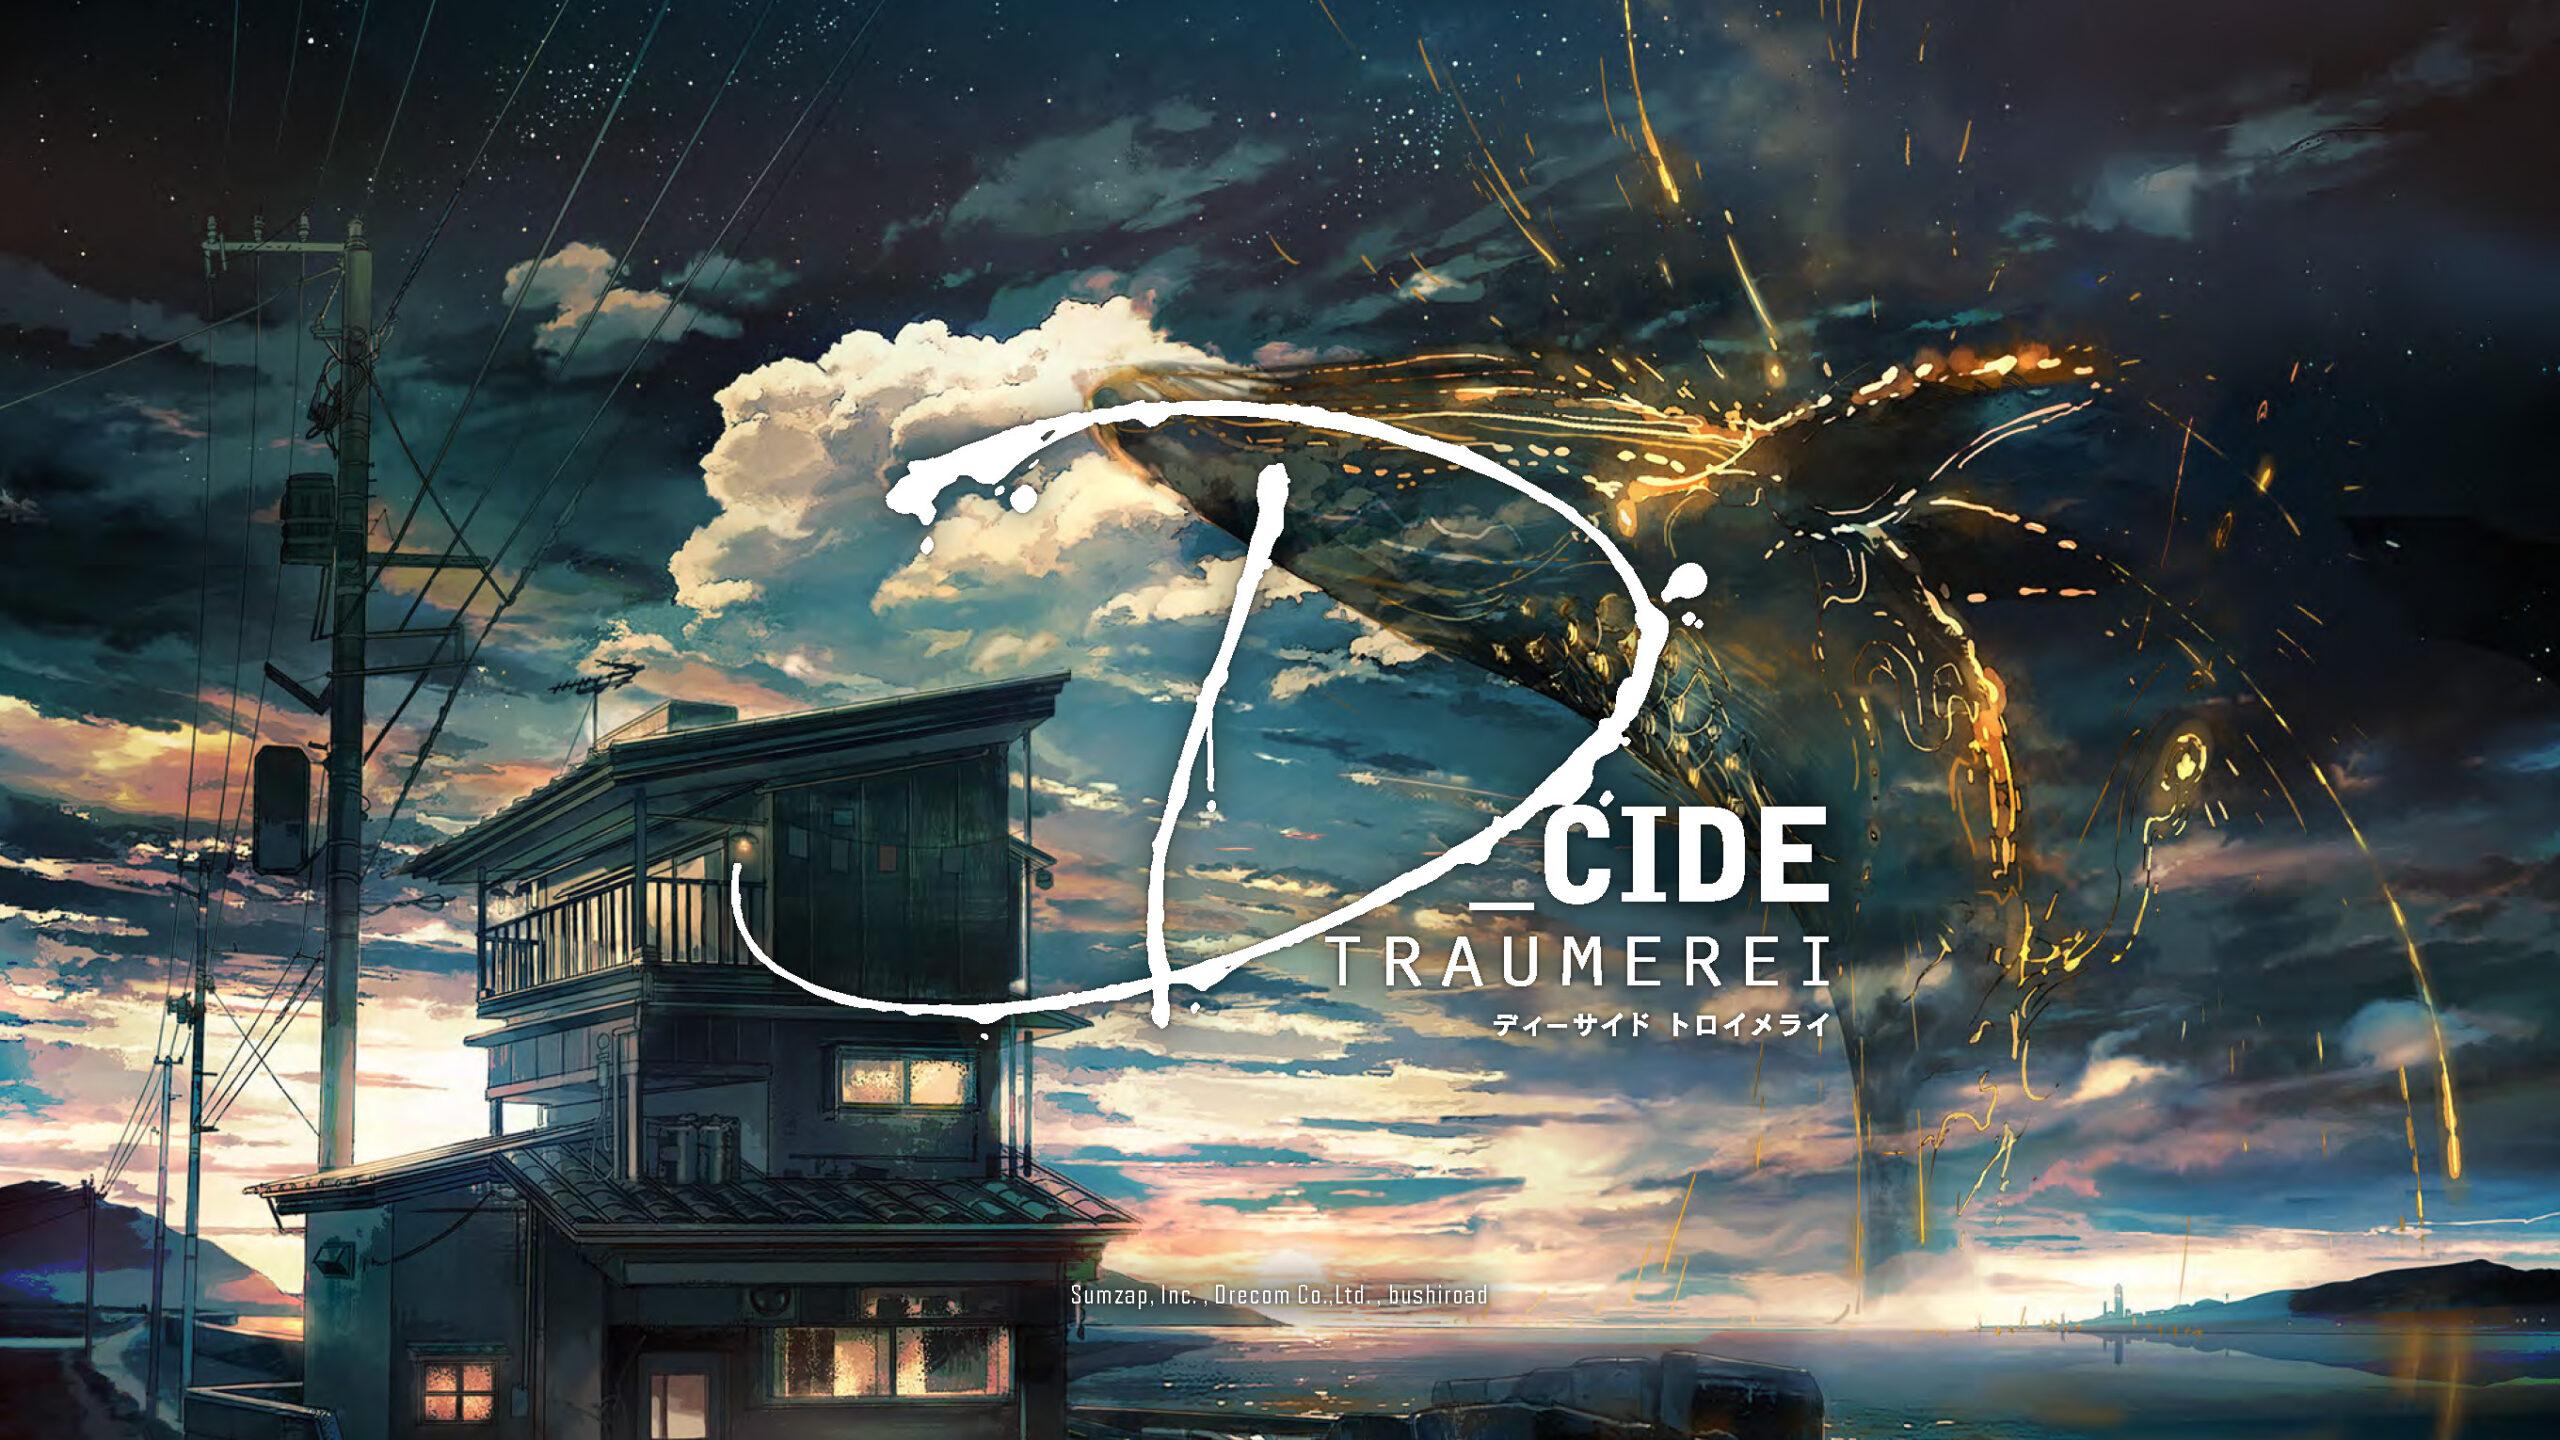 Projeto multimídia 'D_Cide Traumerei' tem anime anunciado